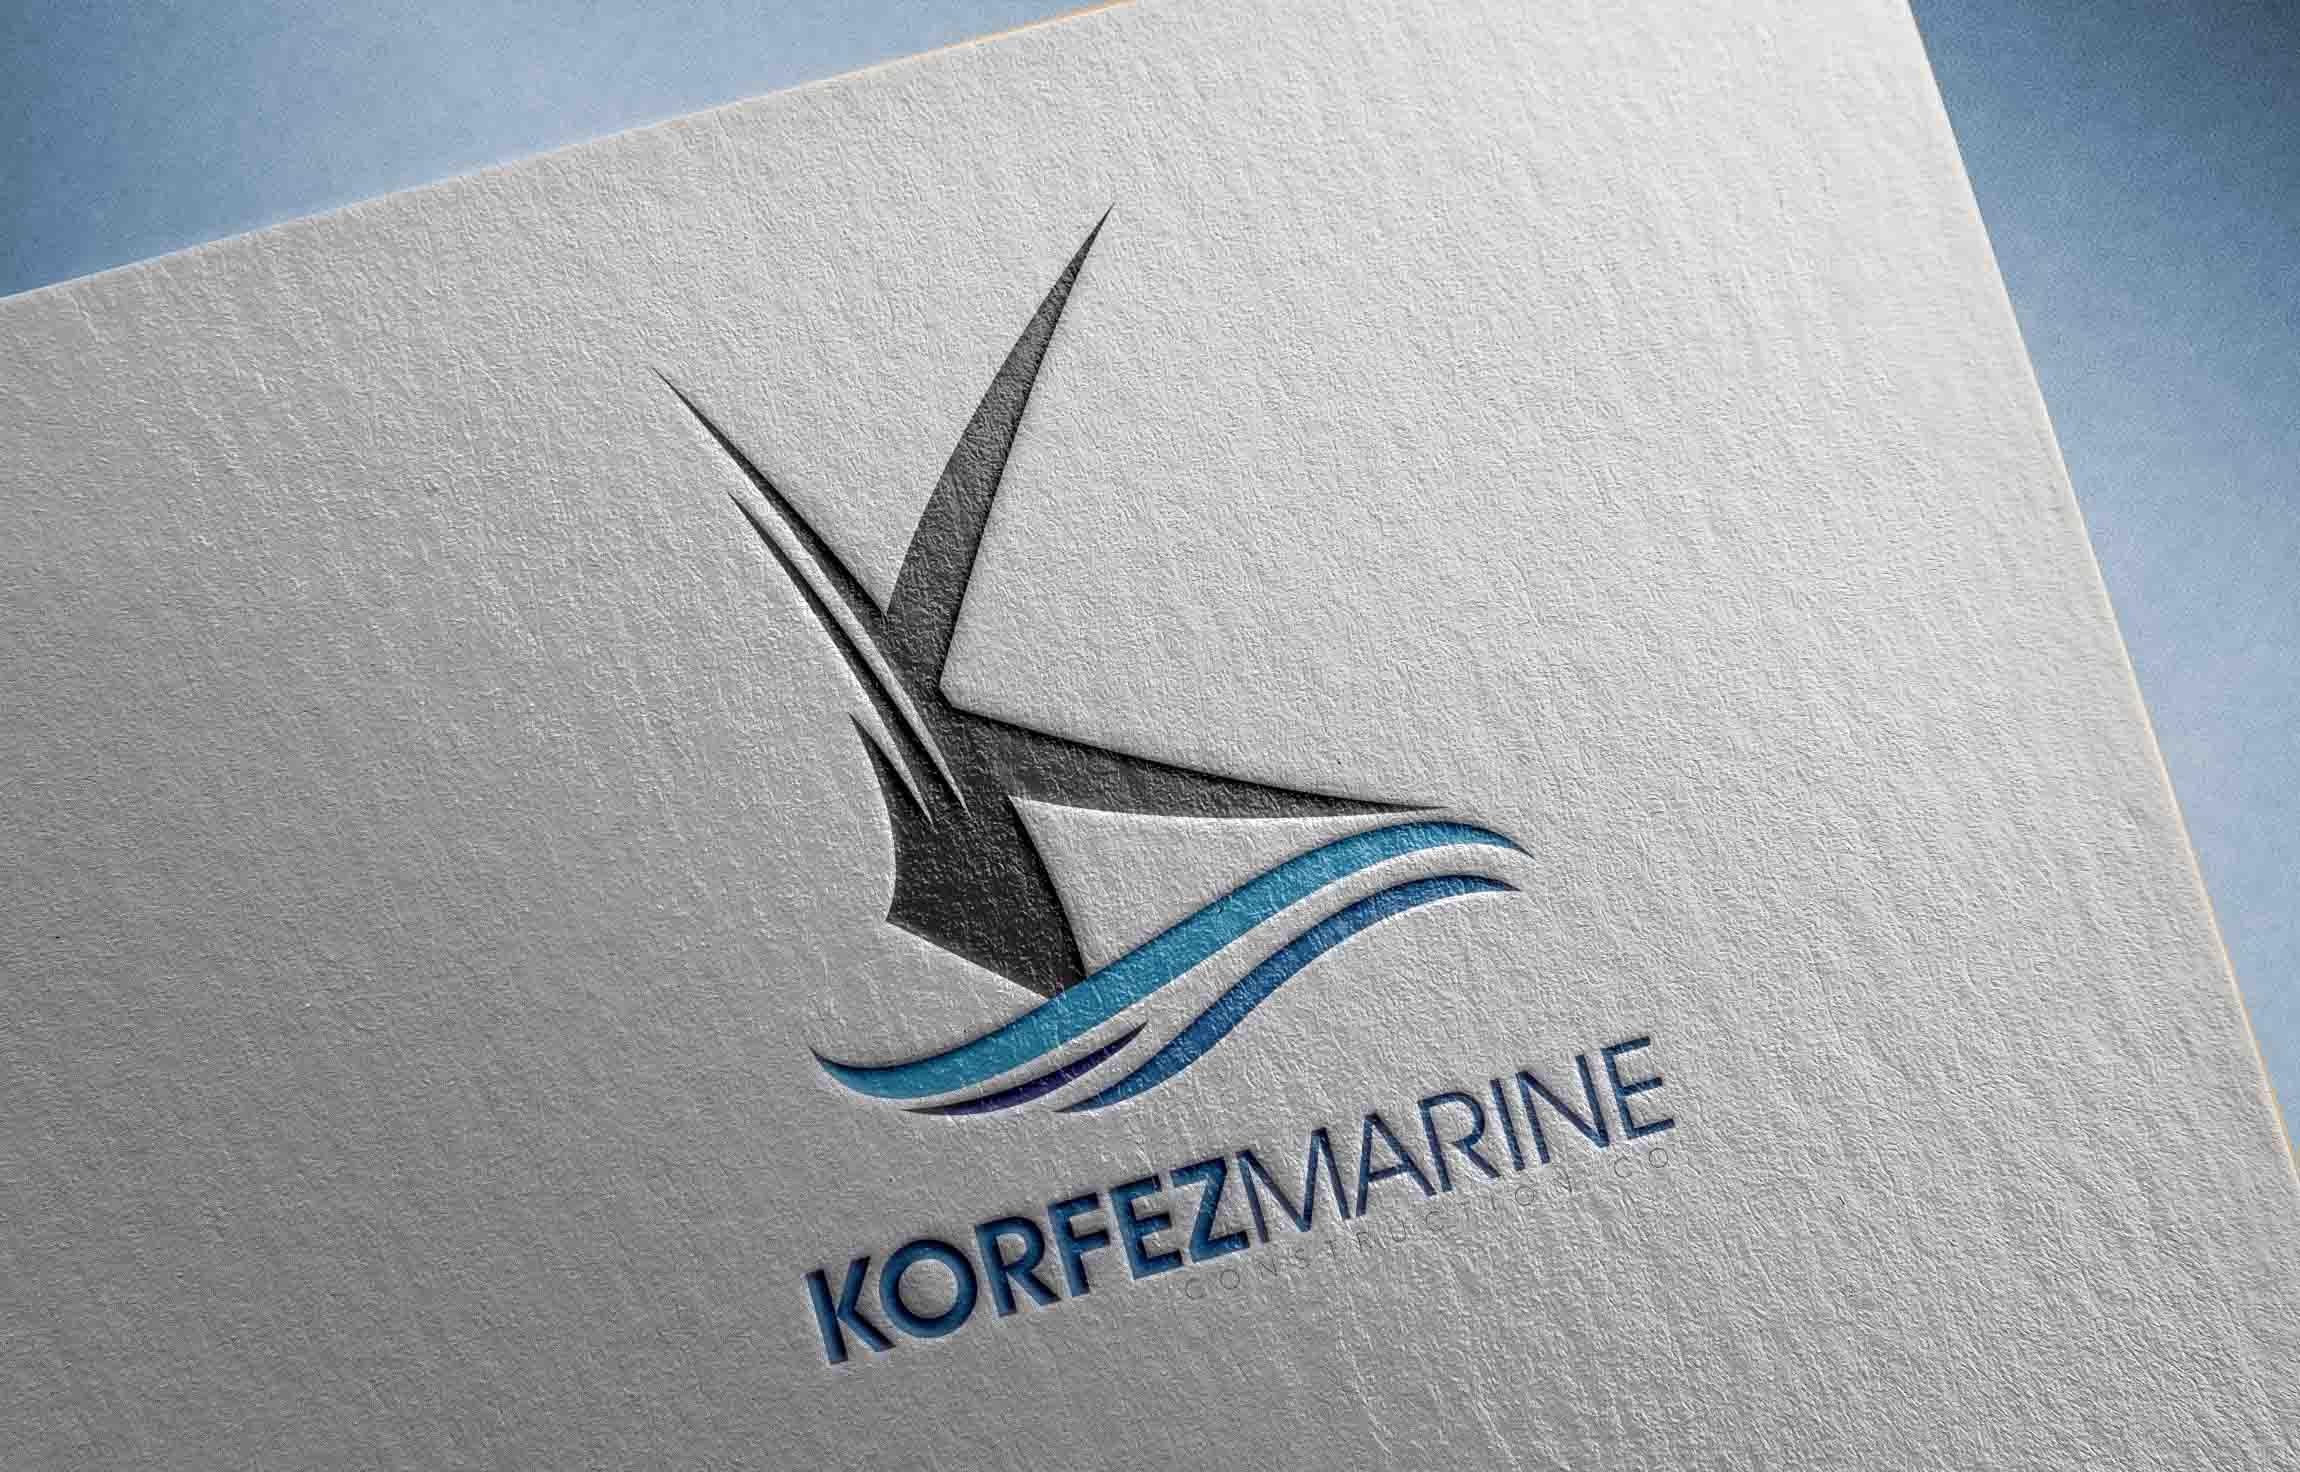 https://rdmedya.com/wp-content/uploads/2020/04/korfez-marine-logo-design.jpg